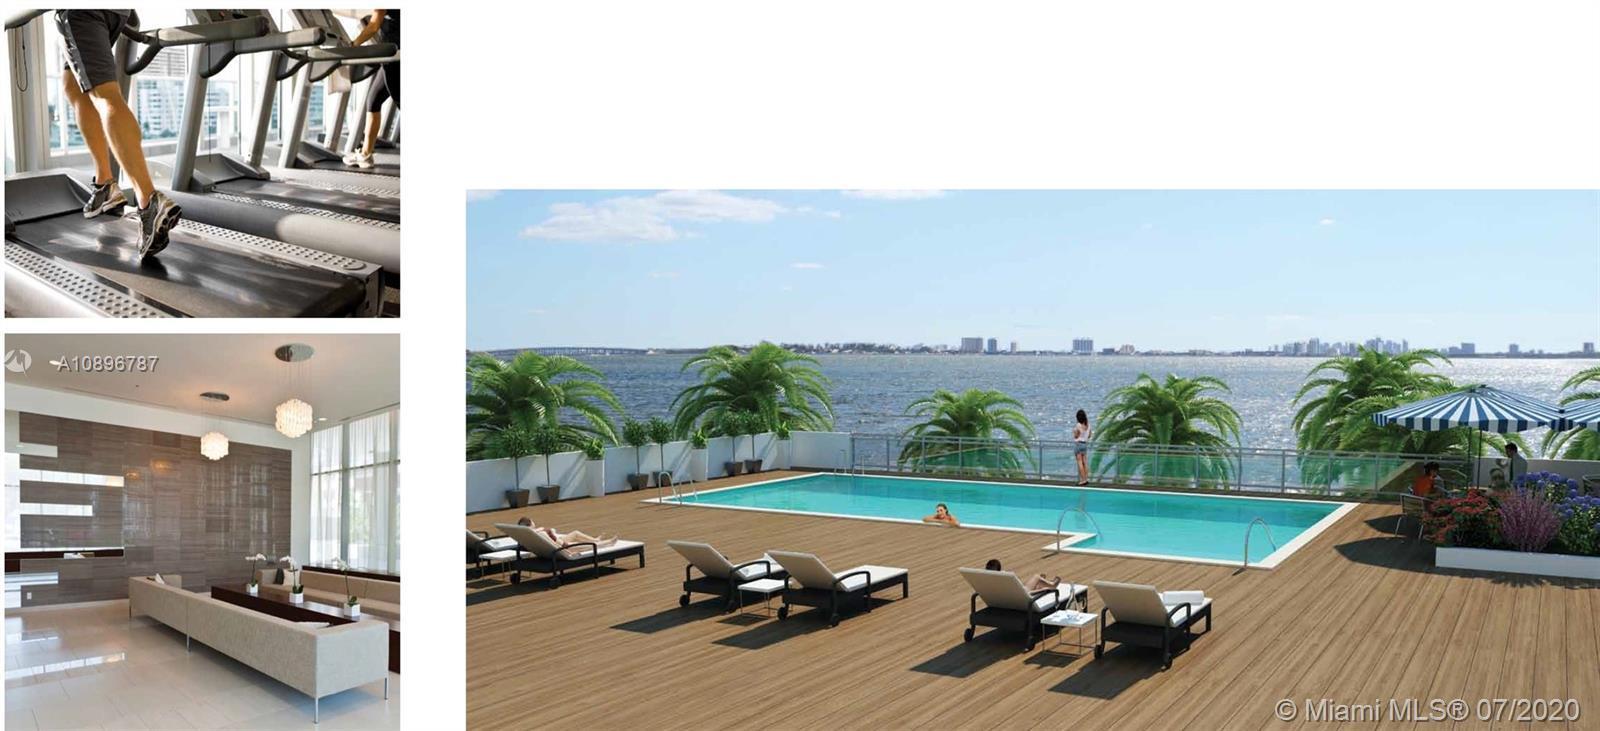 23 Biscayne Bay - Квартиры на продажу